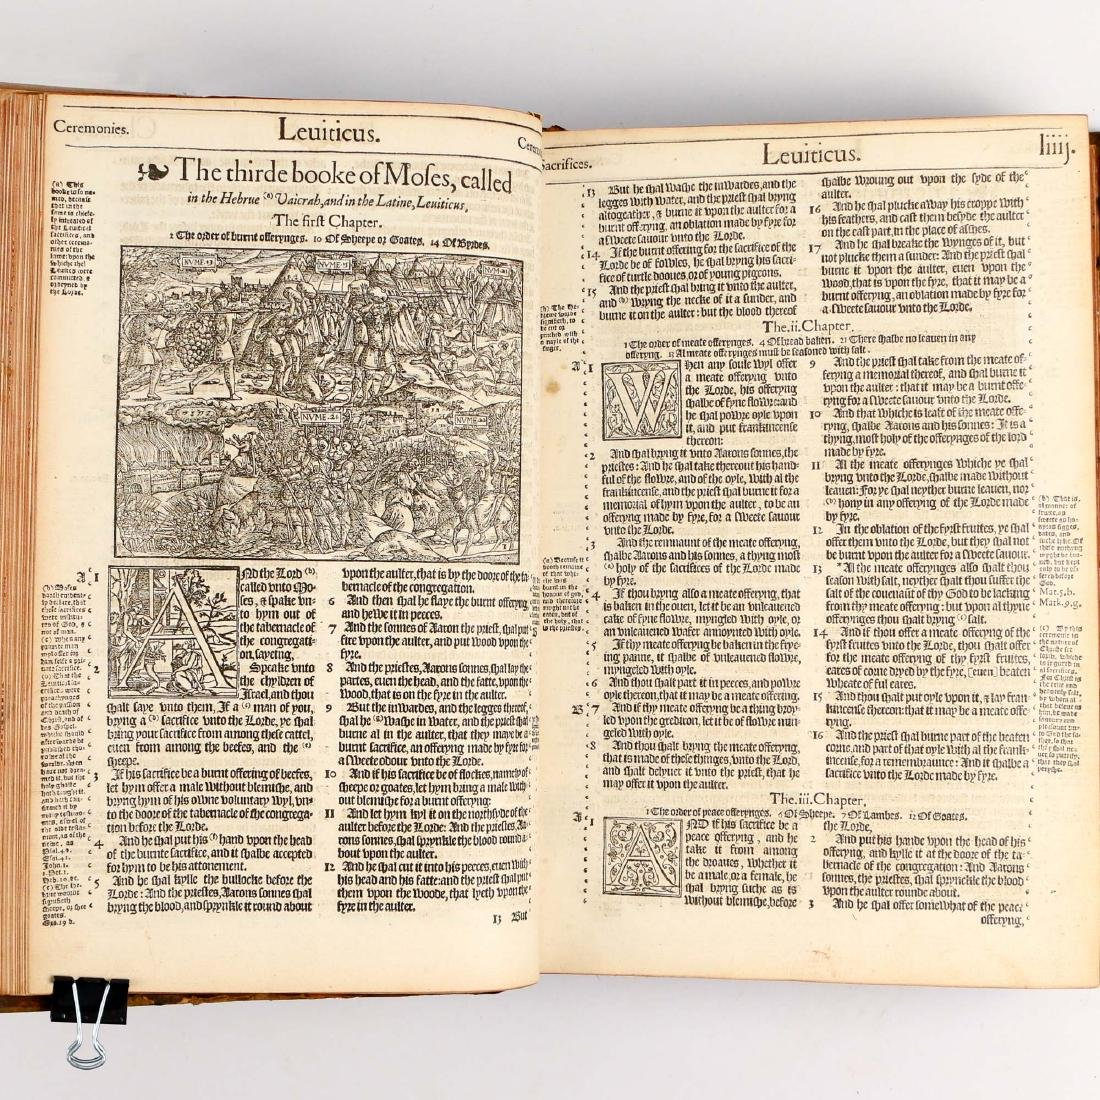 [FRANCIS FRY COPY] BISHOPS' BIBLE [1572] - 17